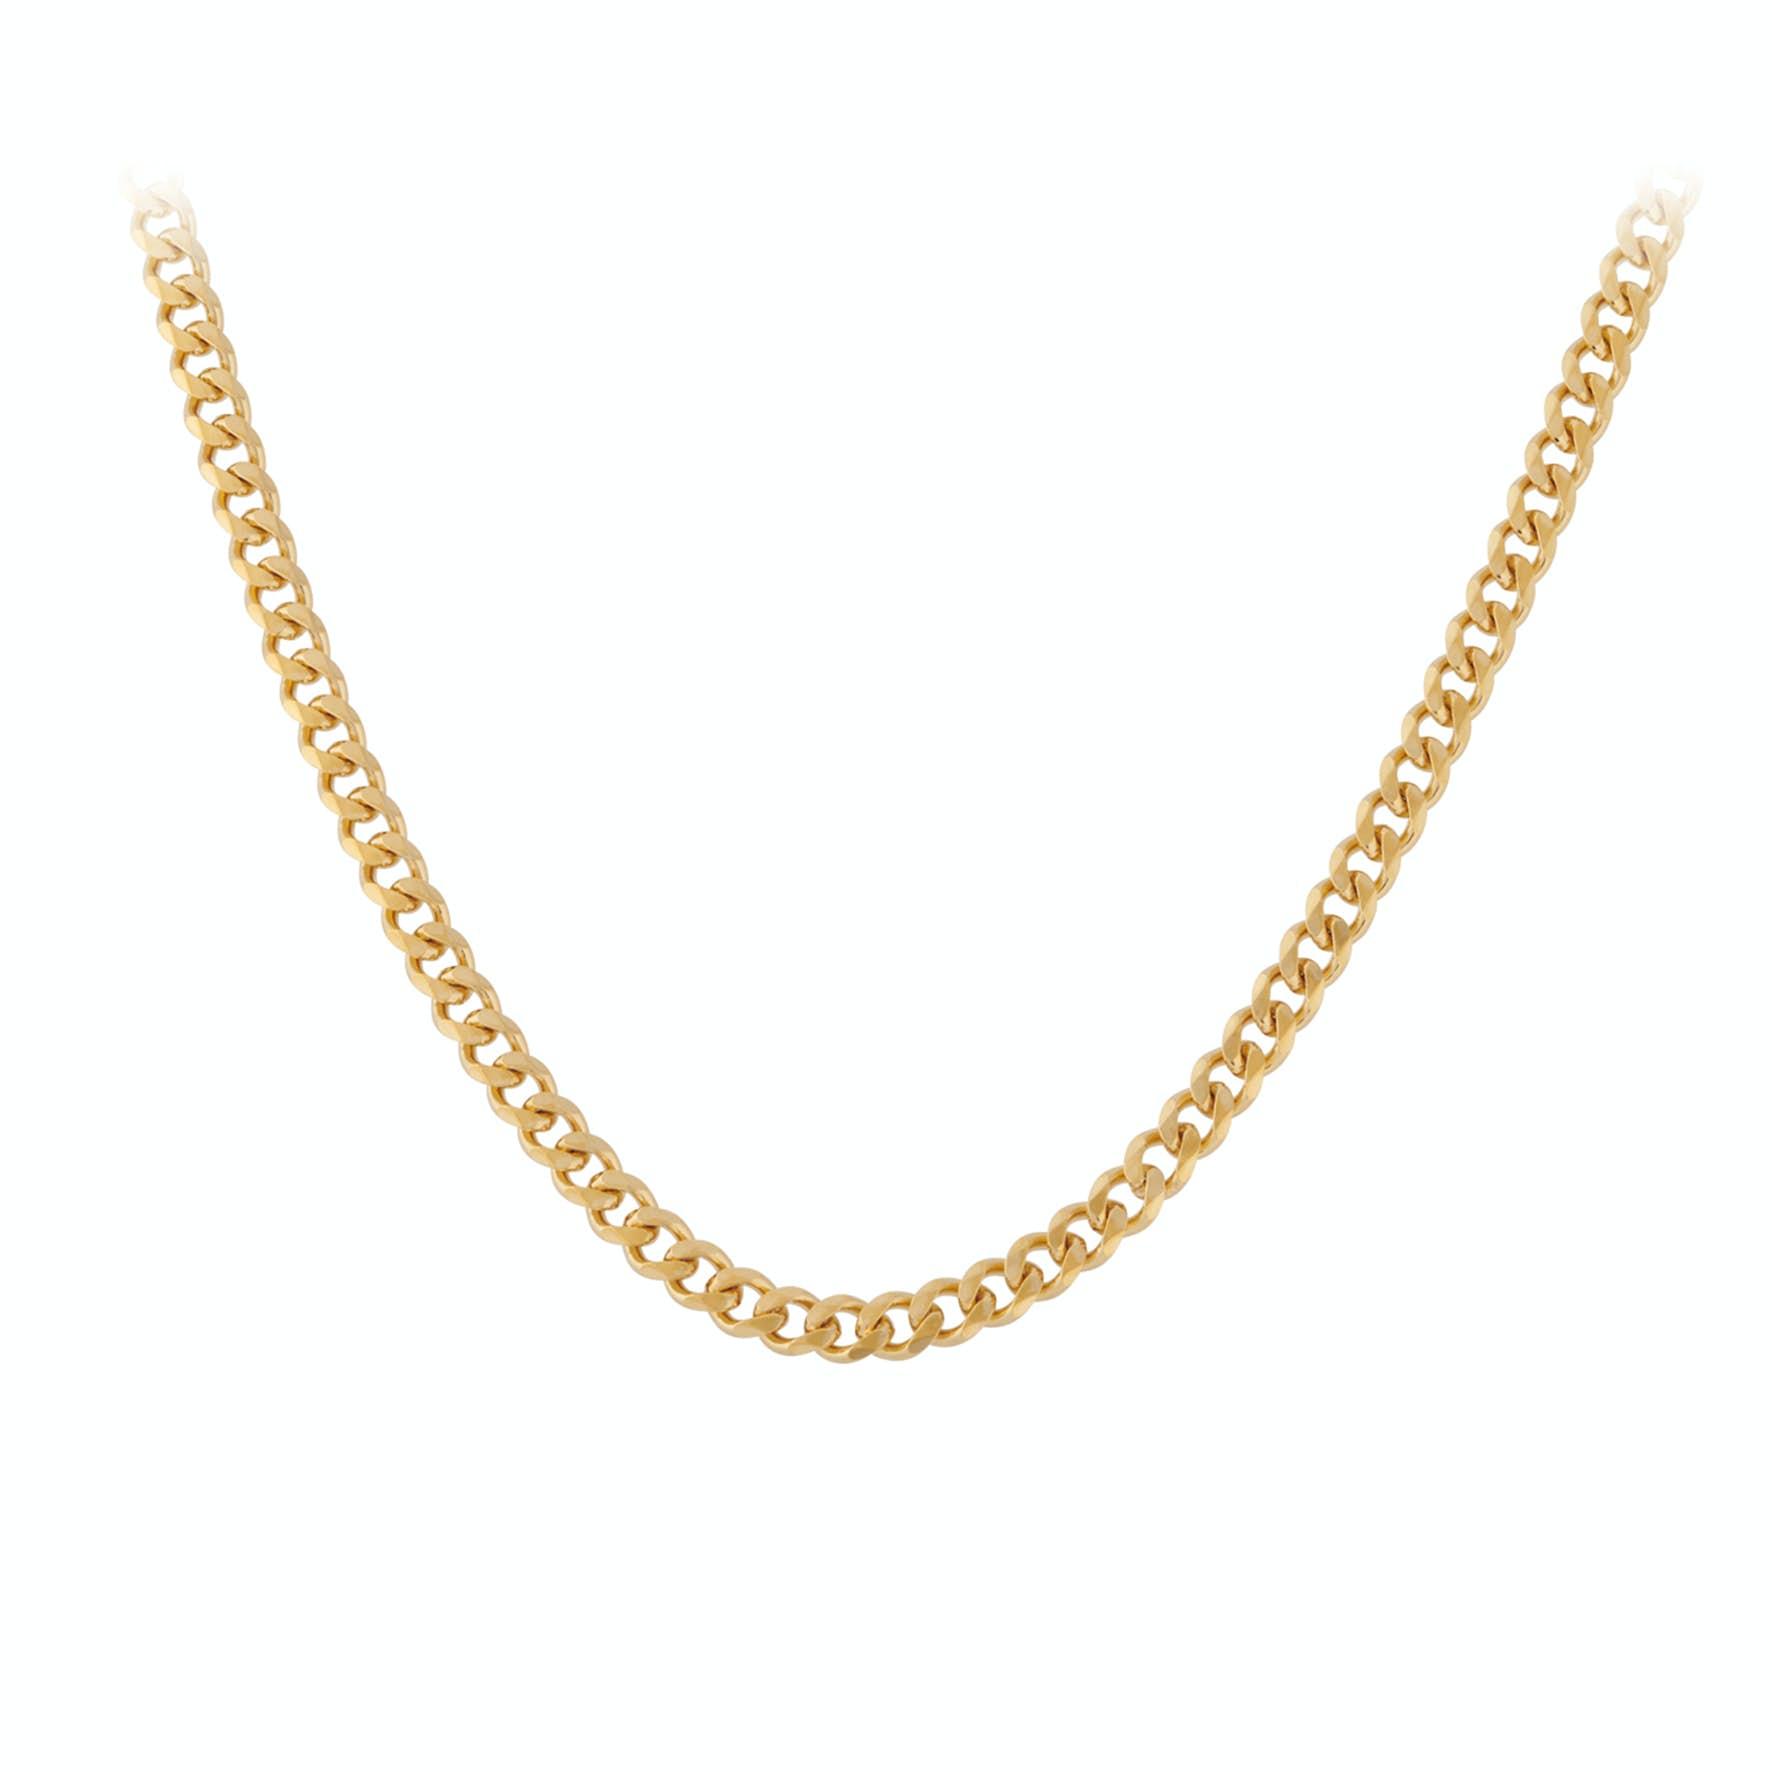 Solid Necklace Short von Pernille Corydon in Vergoldet-Silber Sterling 925